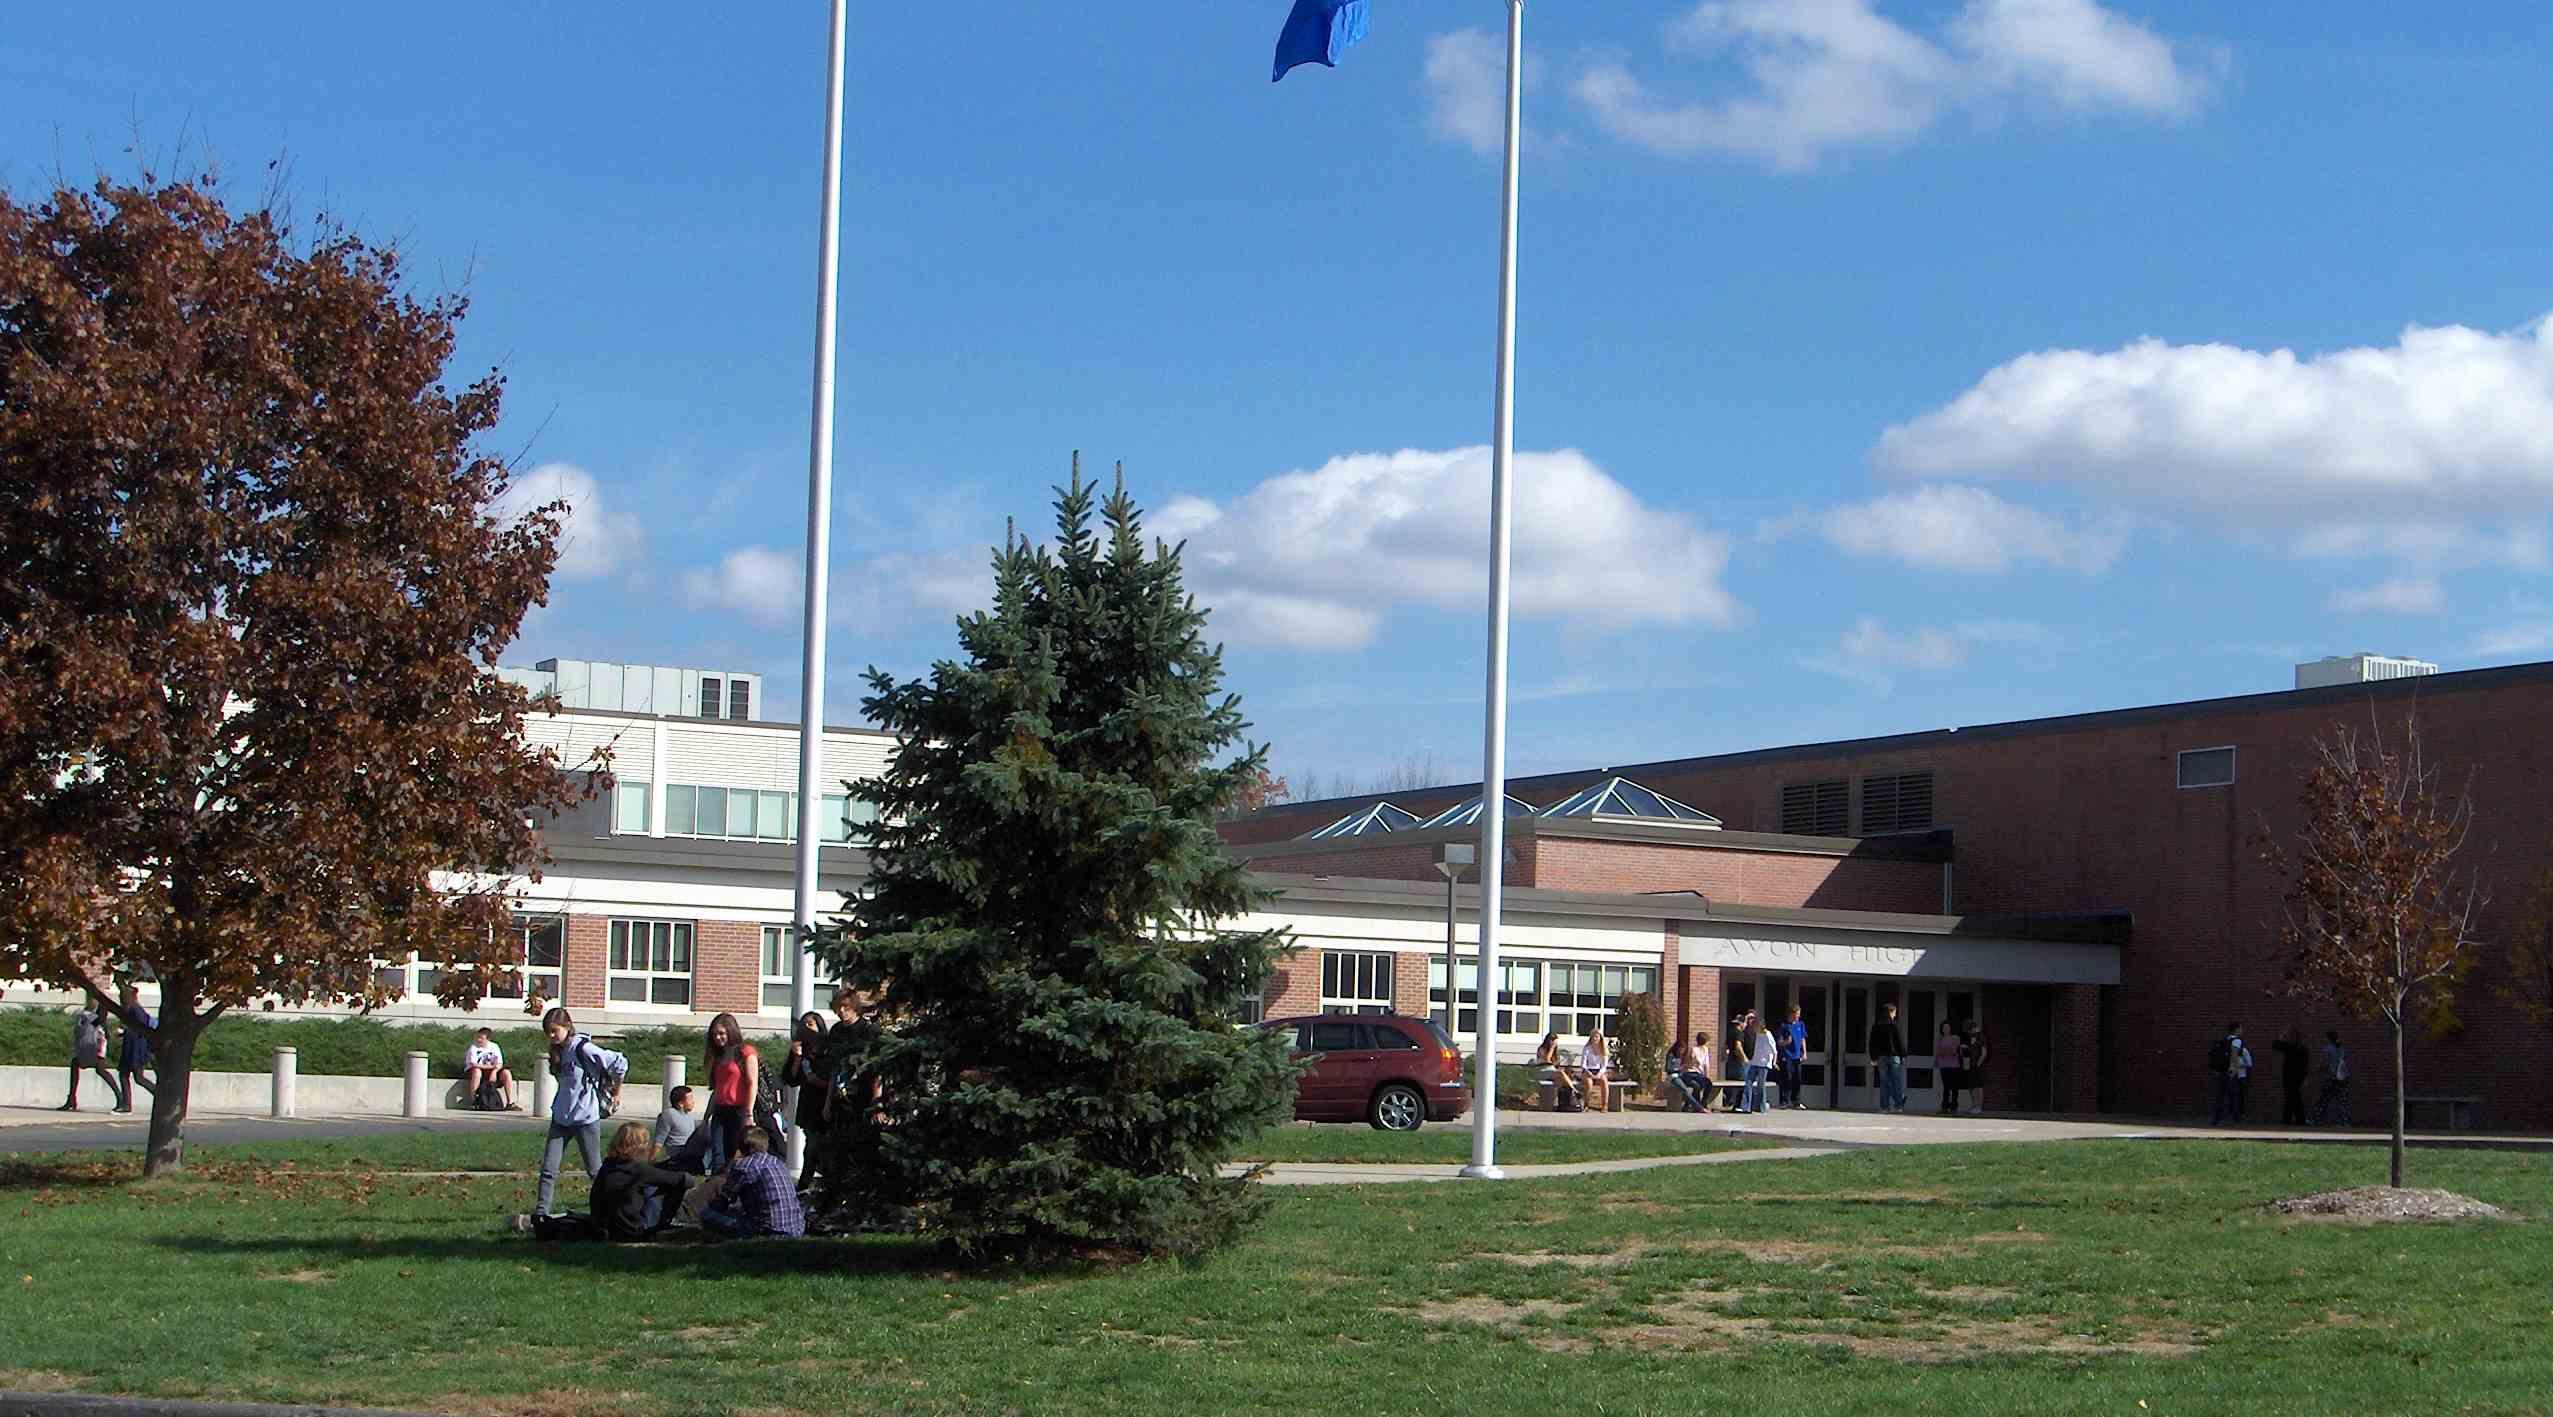 ... File:Avon High School.